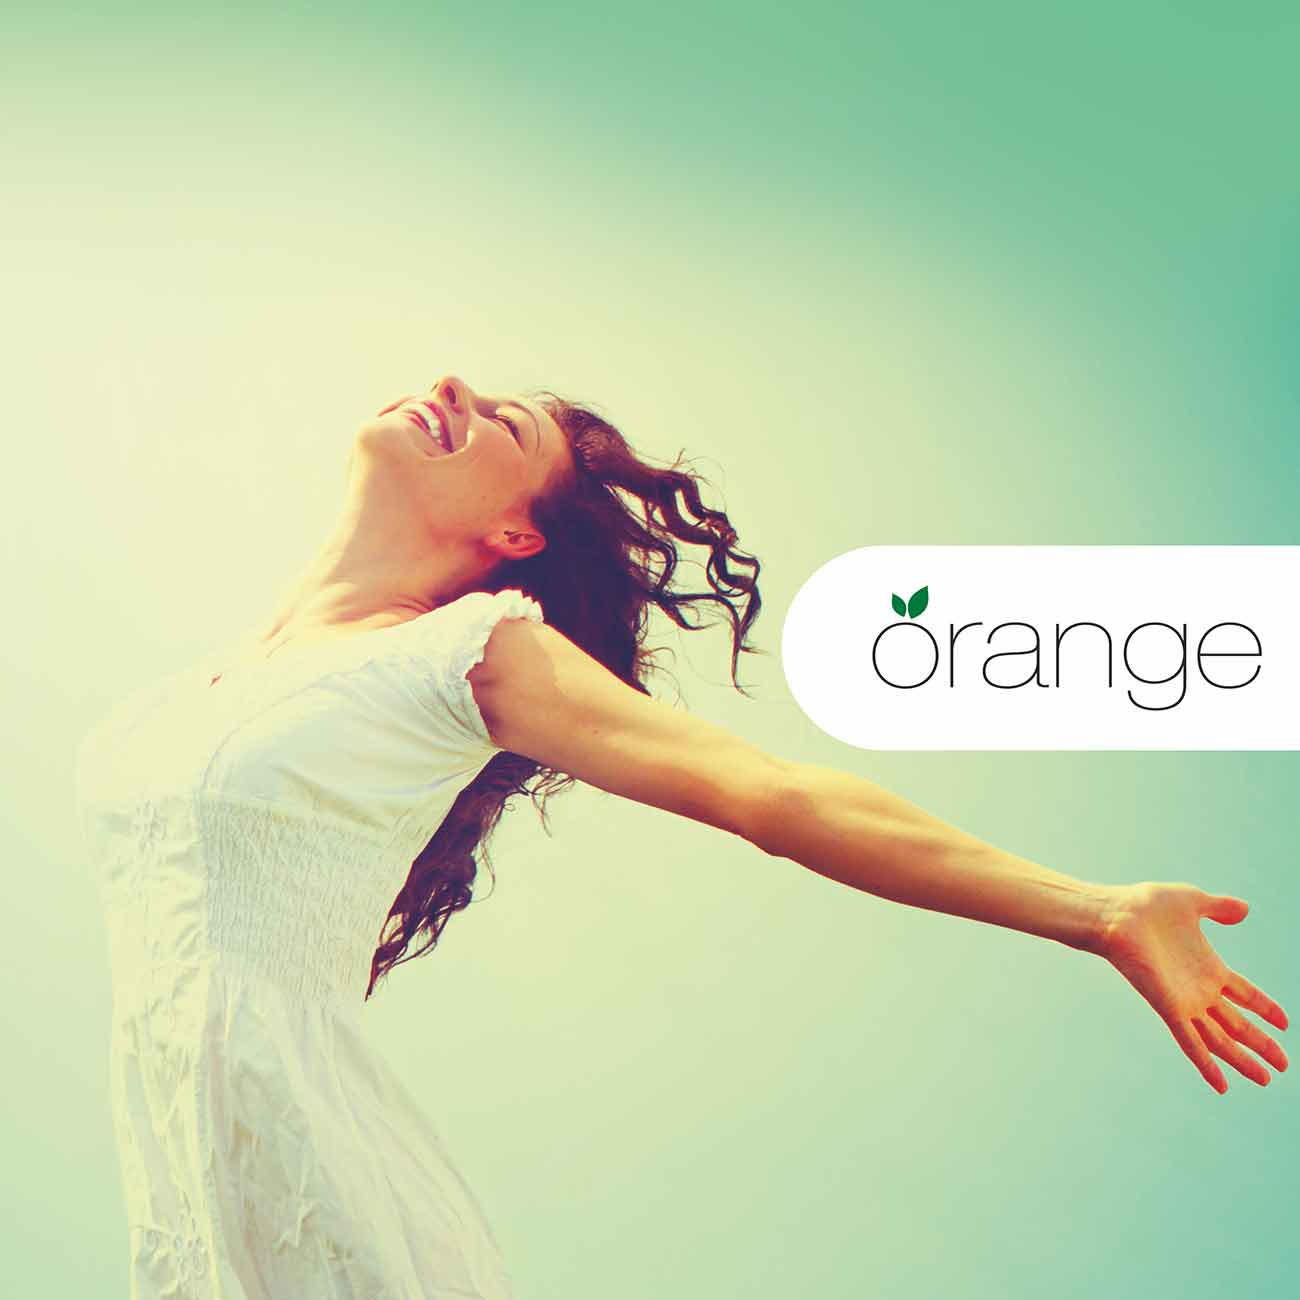 Orange-front-image